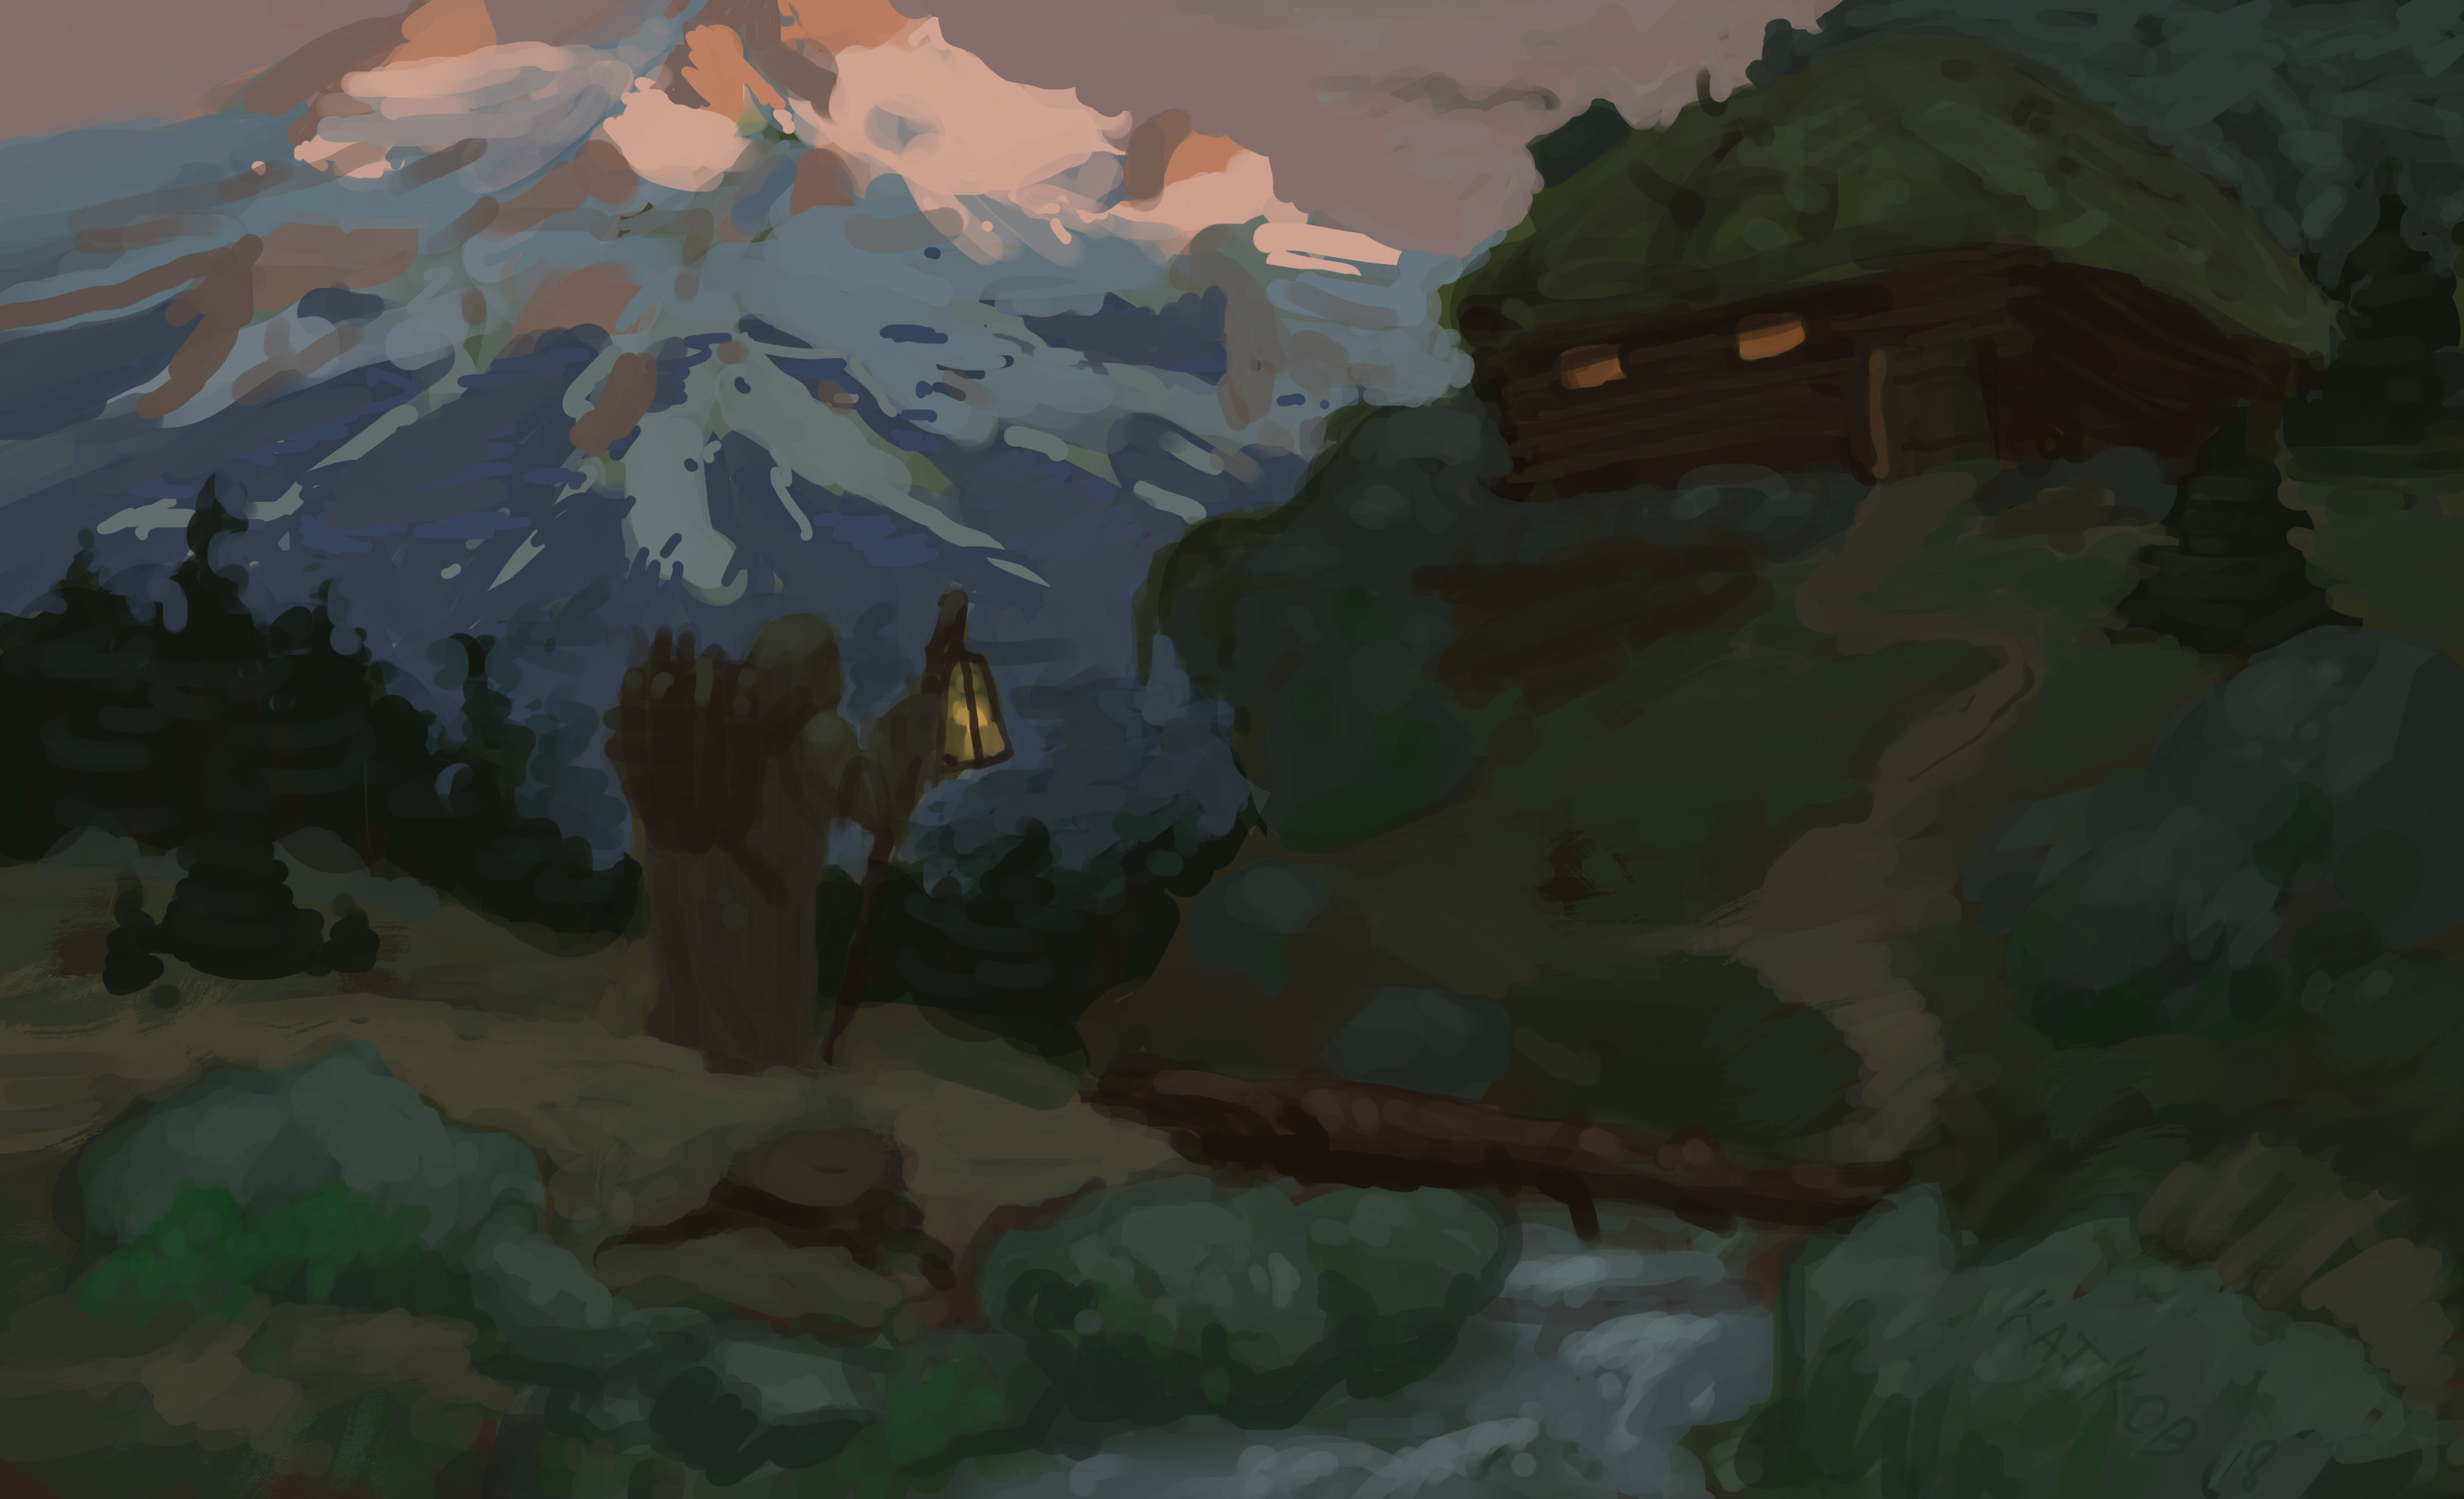 Домик в горах .jpg